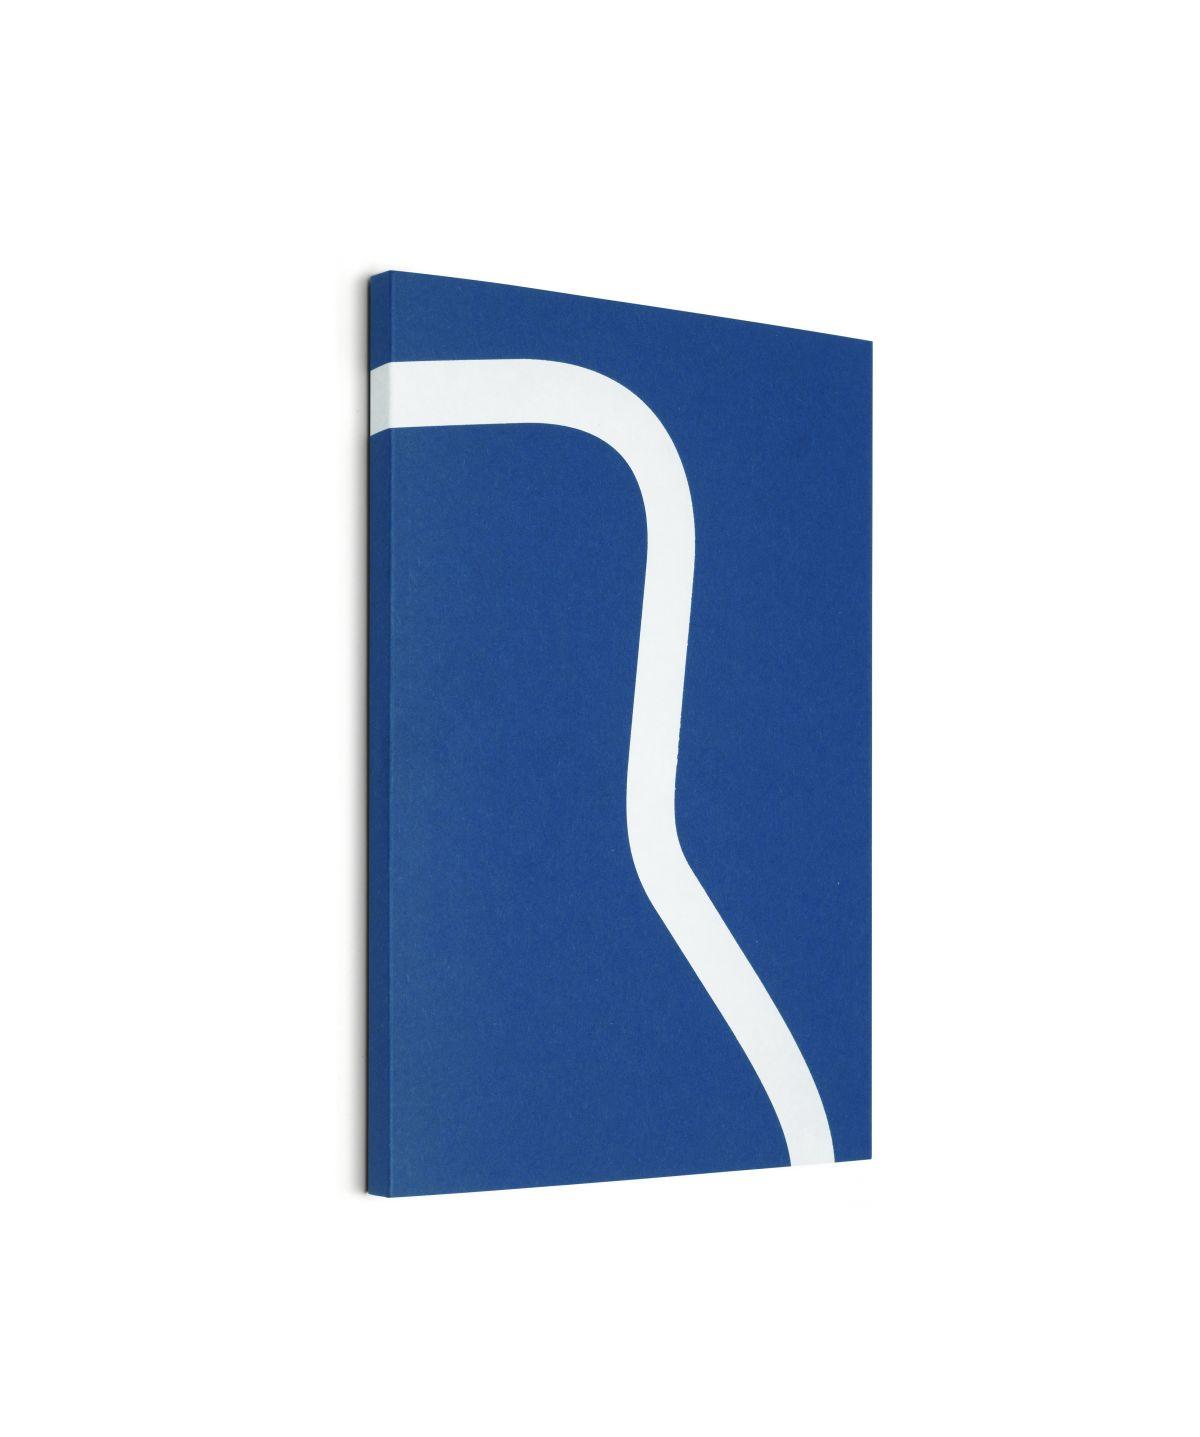 Outline Notebook, Tsto blue